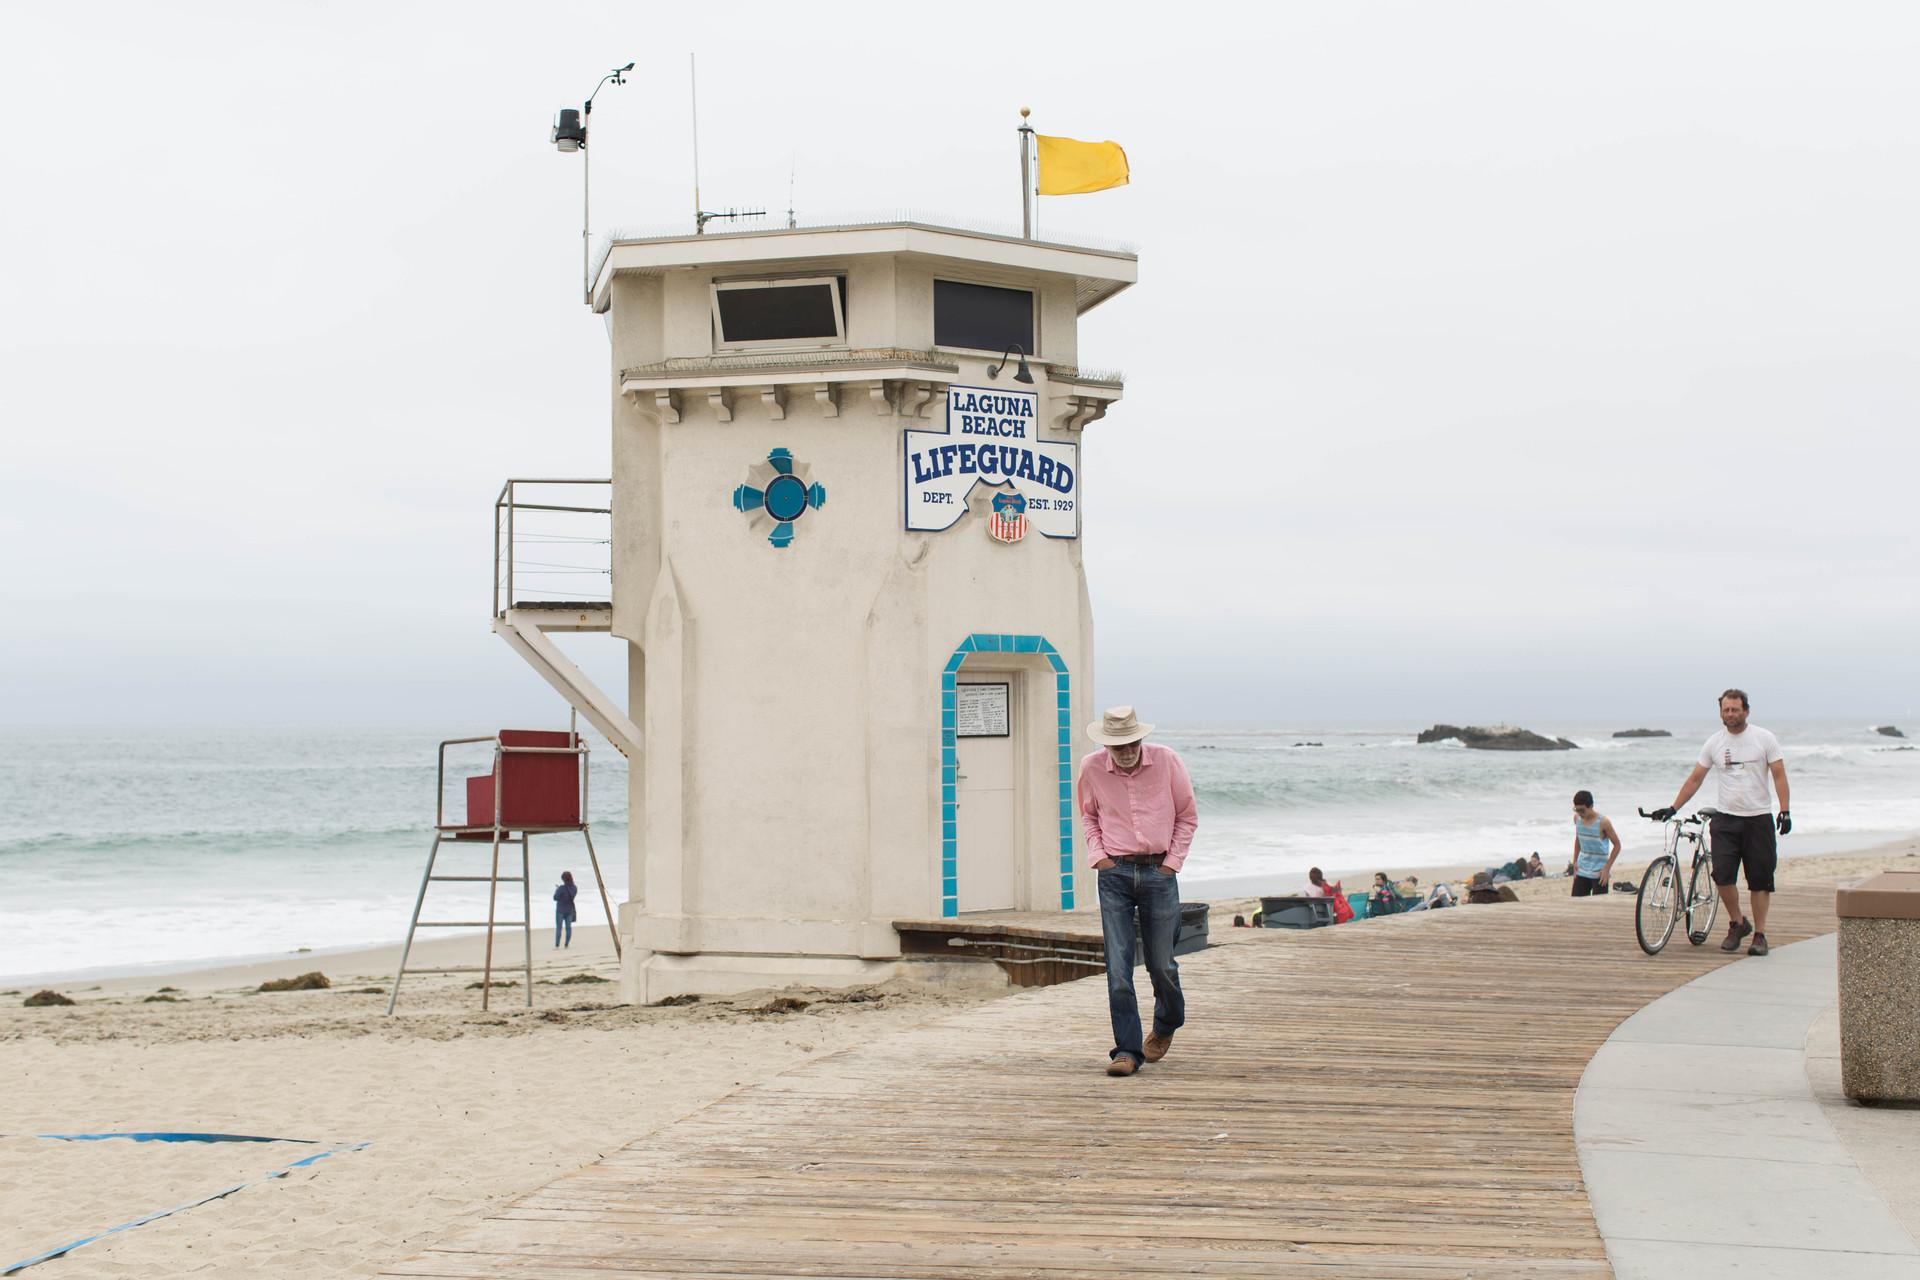 Laguna Beach, CA. -